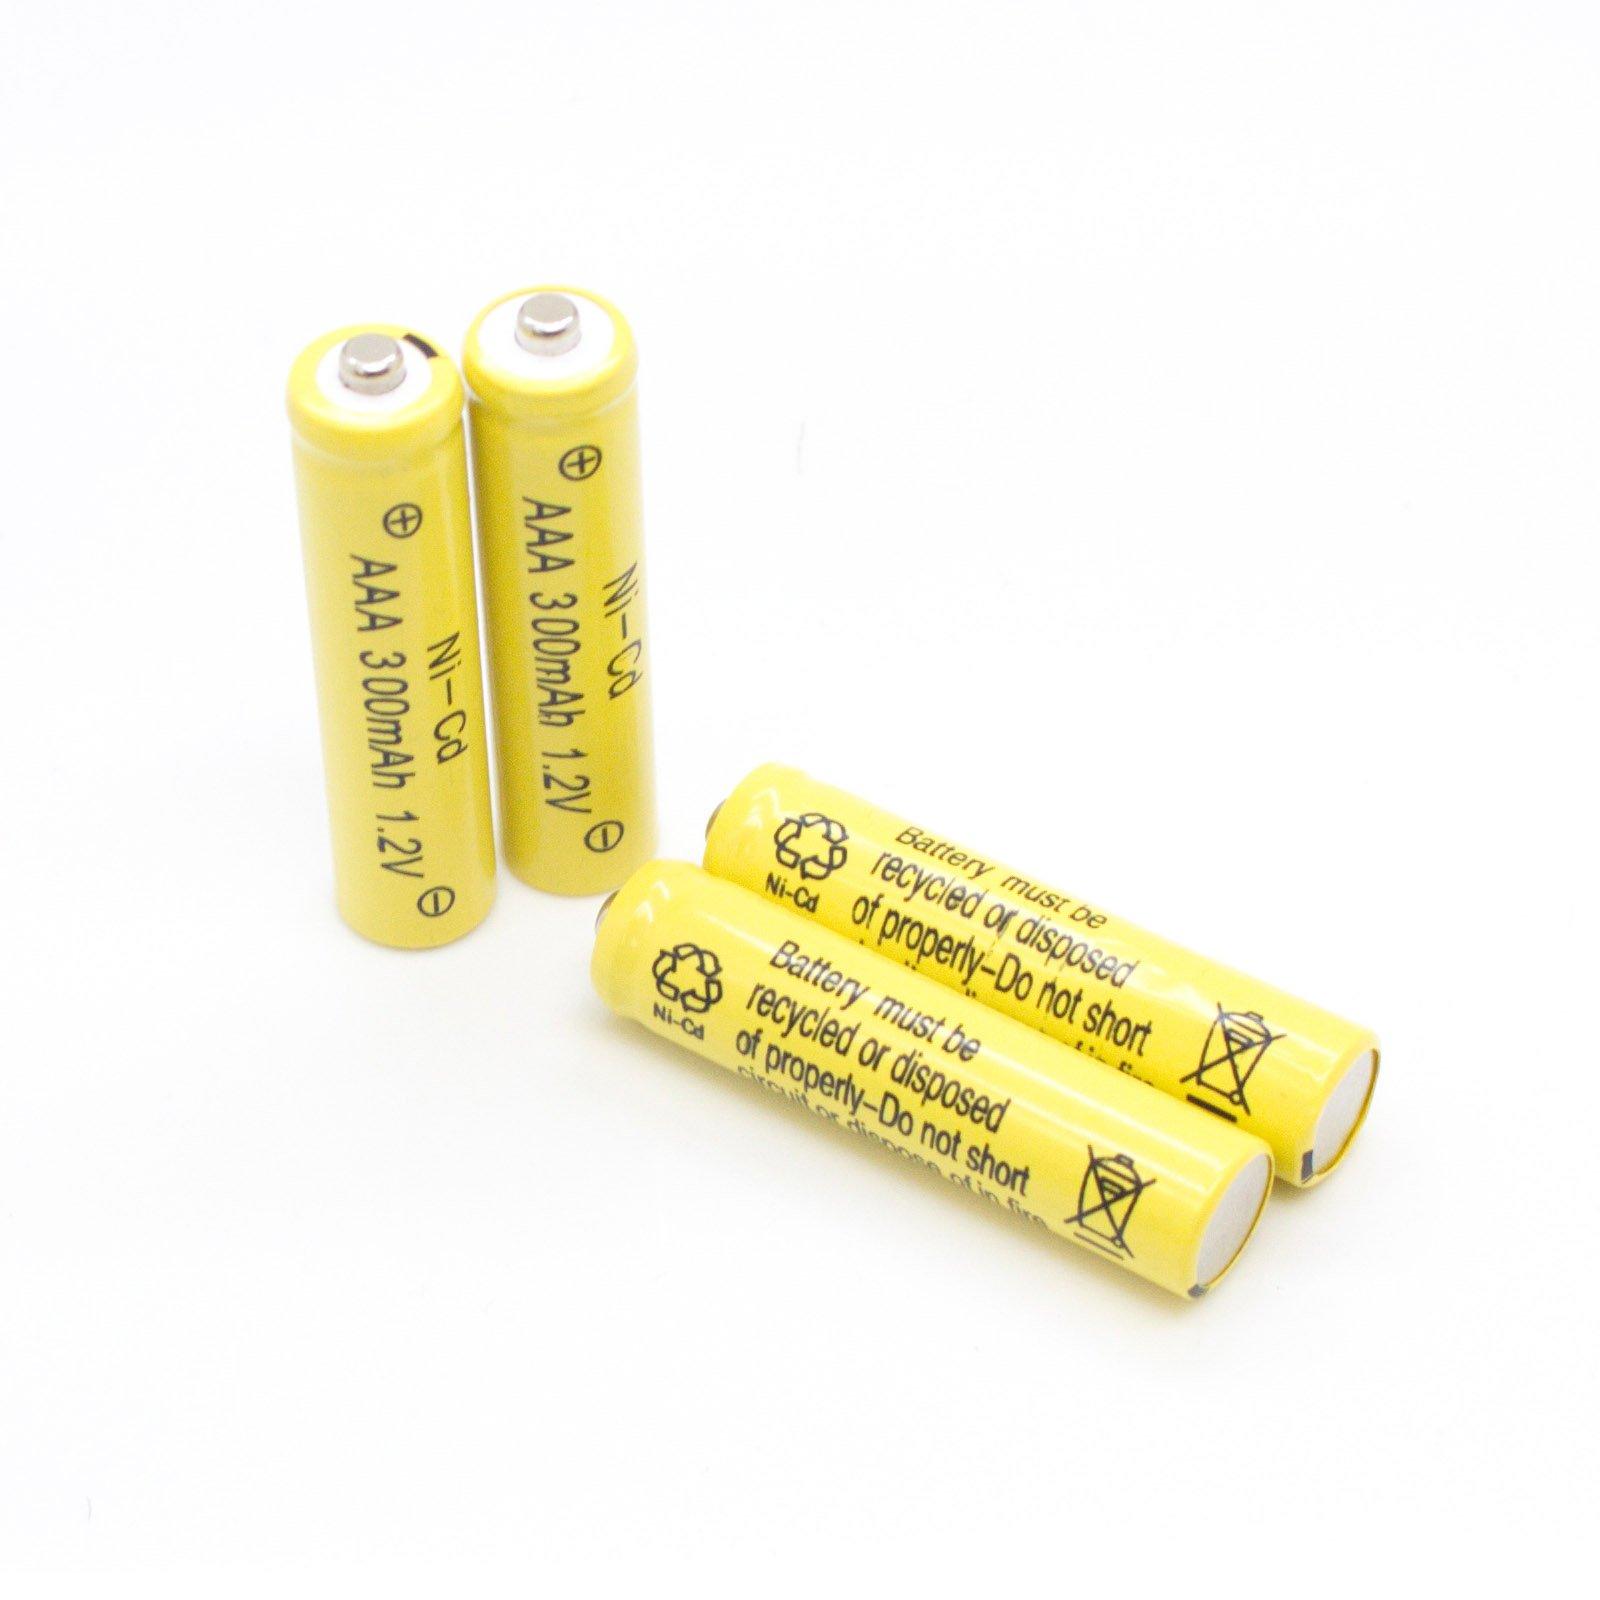 Solar Light Replacement AAA Ni-Cd 300mah Rechargable Batteries (Pack of 12) (AAA 300mAh)